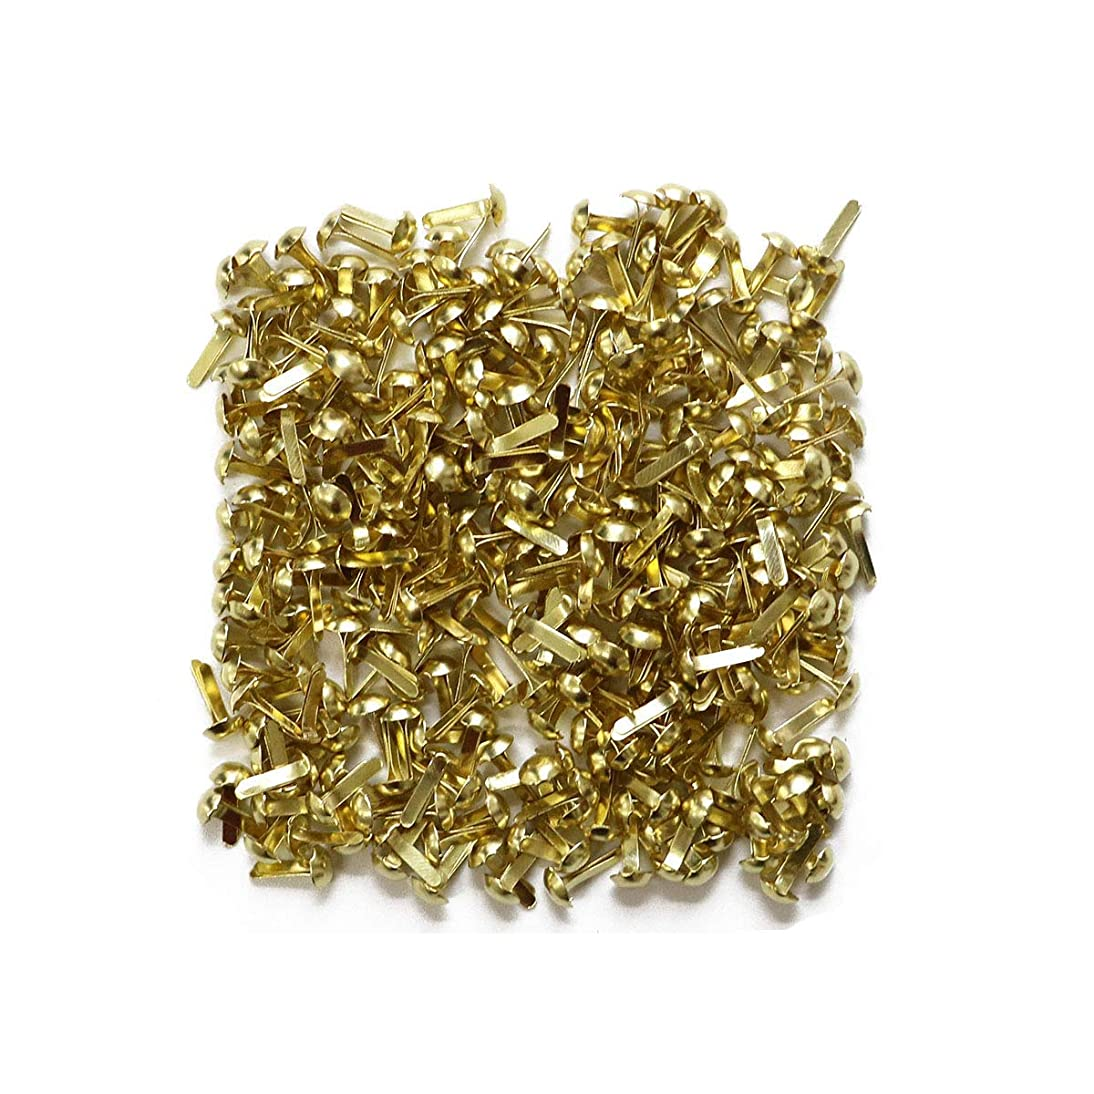 LGEGE 200 Pcs Gold Tone Color Mini Metal Round Brads Craft DIY Paper Fasteners Scrapbooking Decoration Embellishment